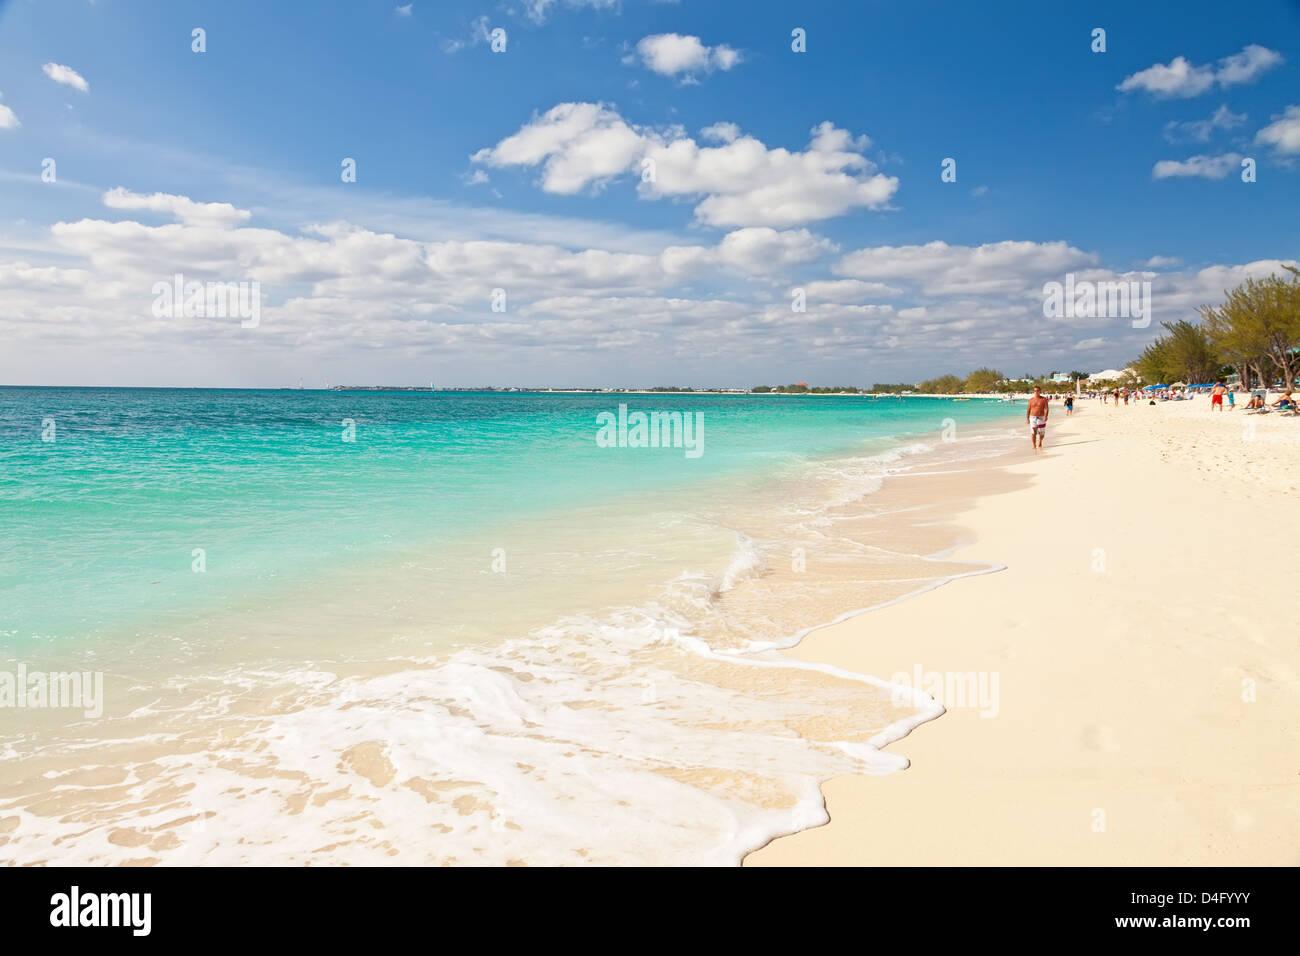 Seven Mile Beach on Cayman Islands - Stock Image